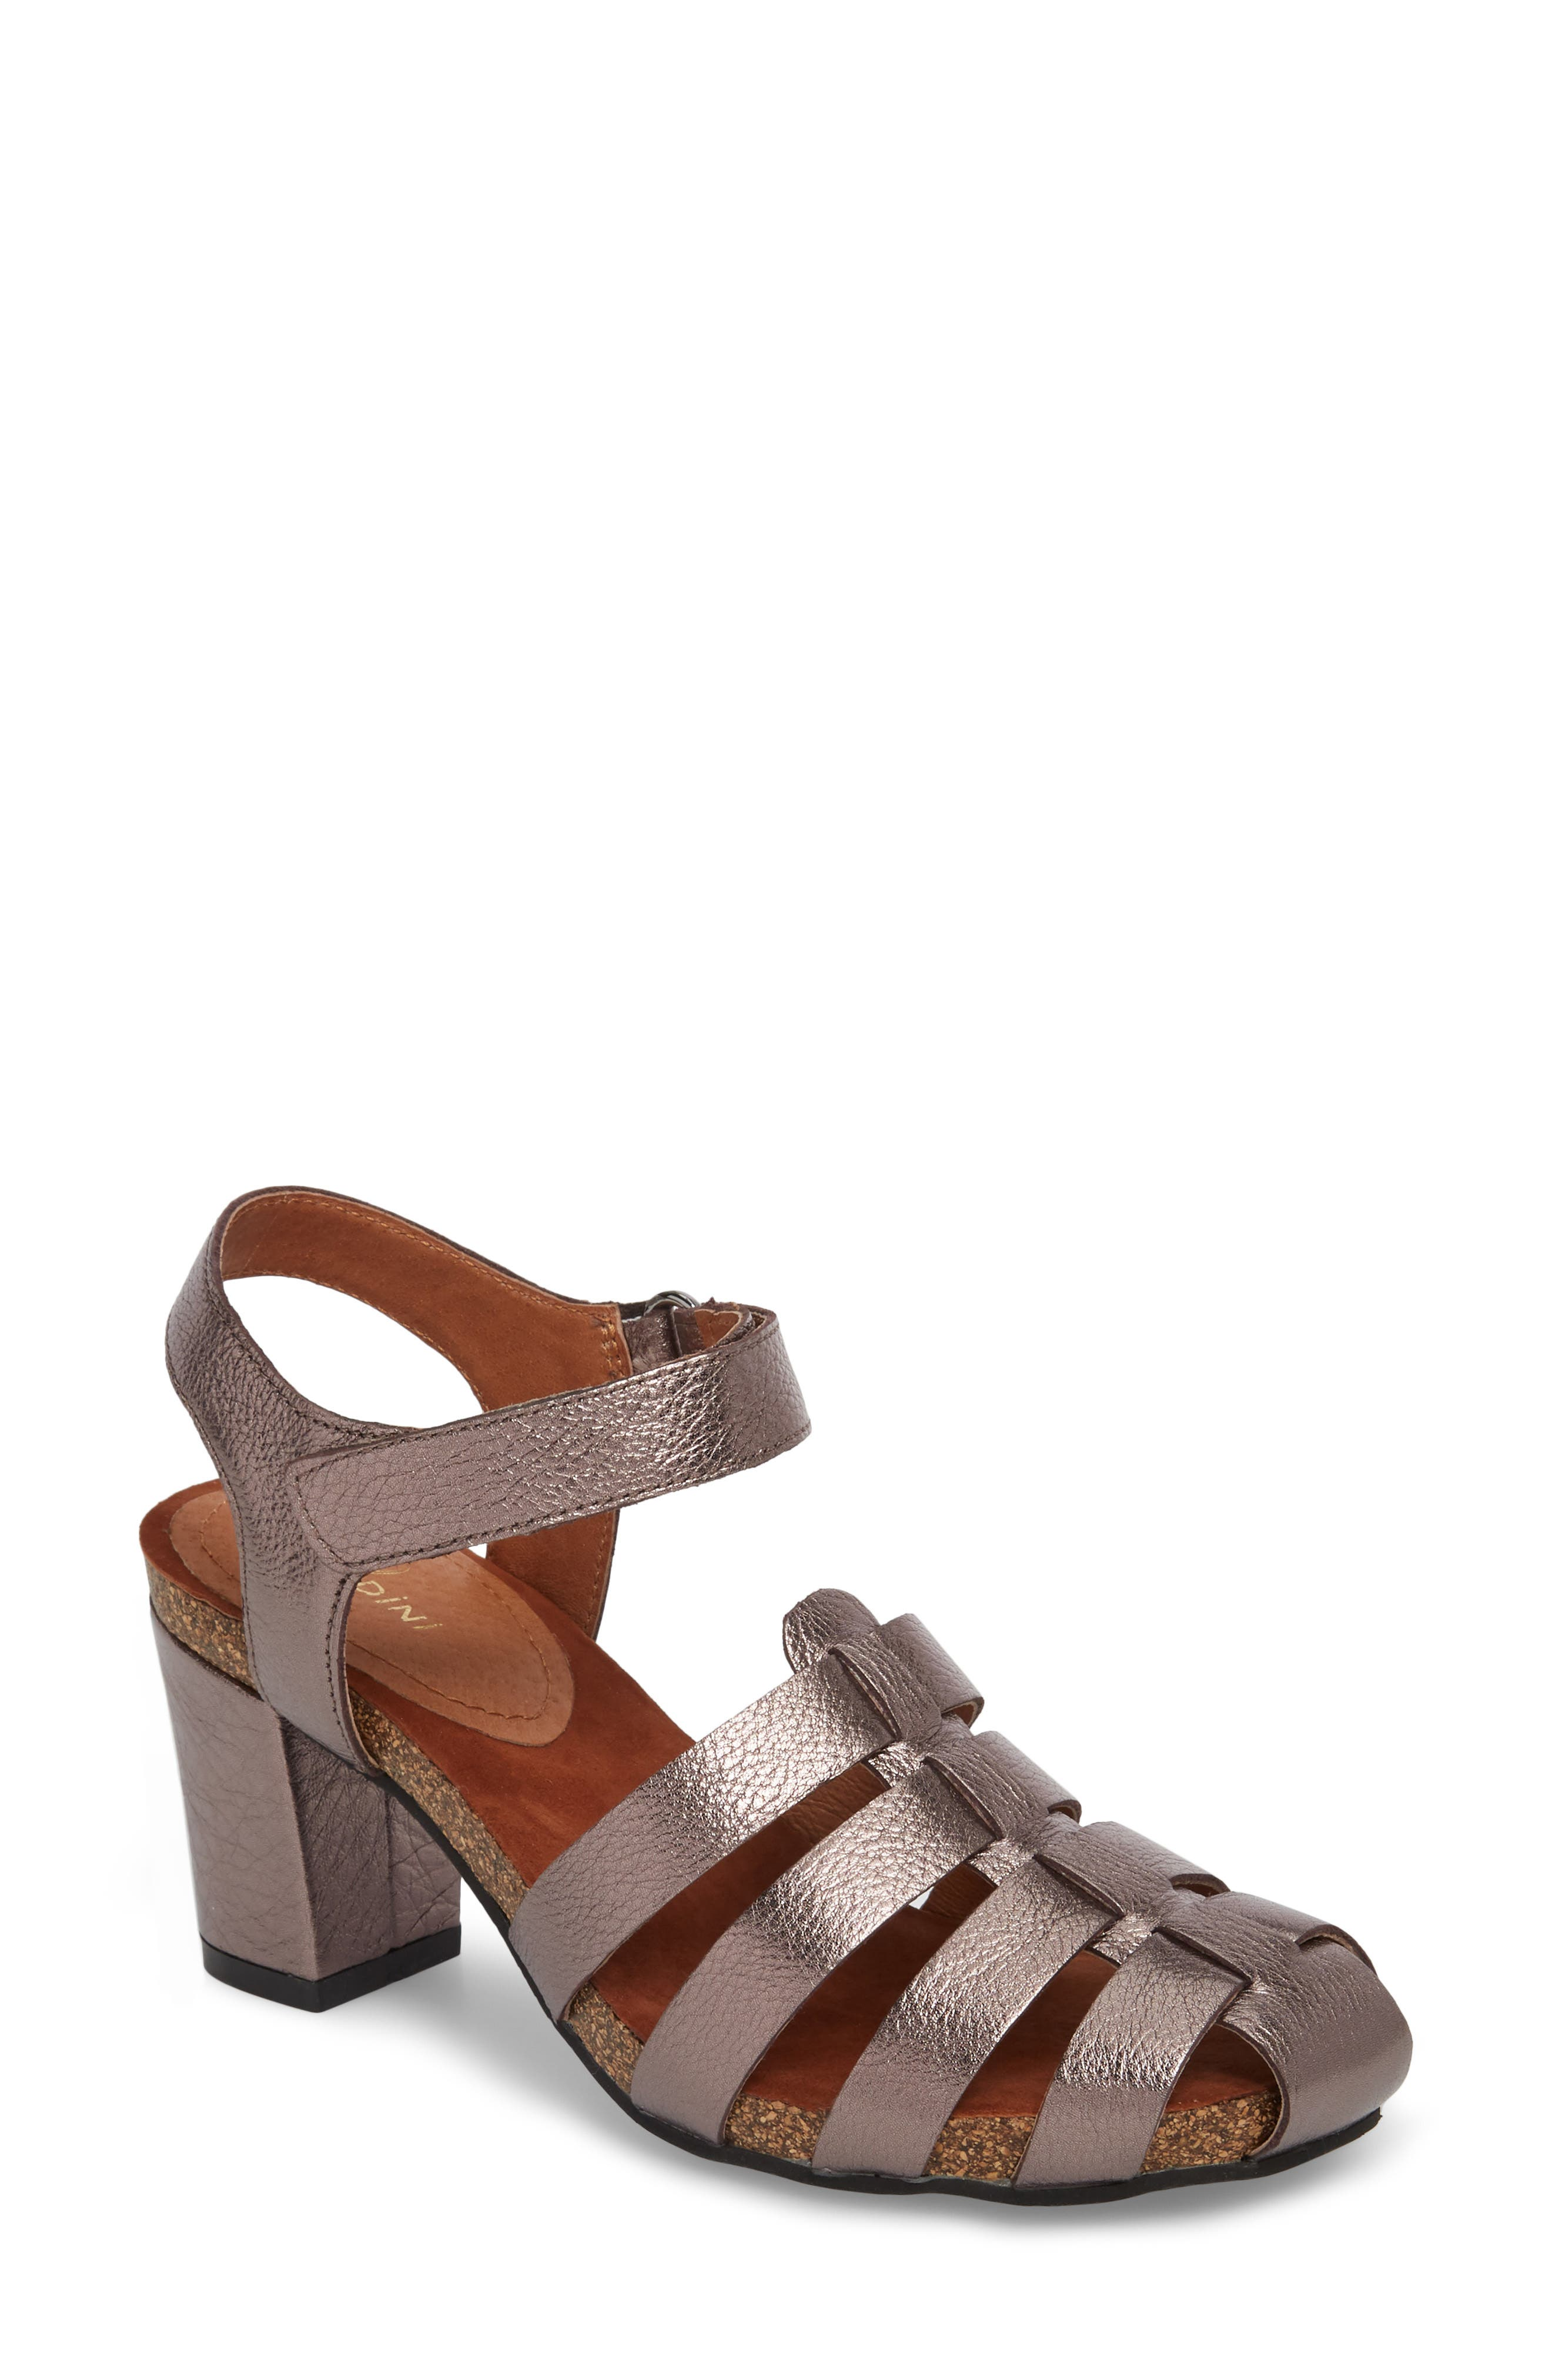 Alternate Image 1 Selected - Sudini Carrara Block Heel Sandal (Women)